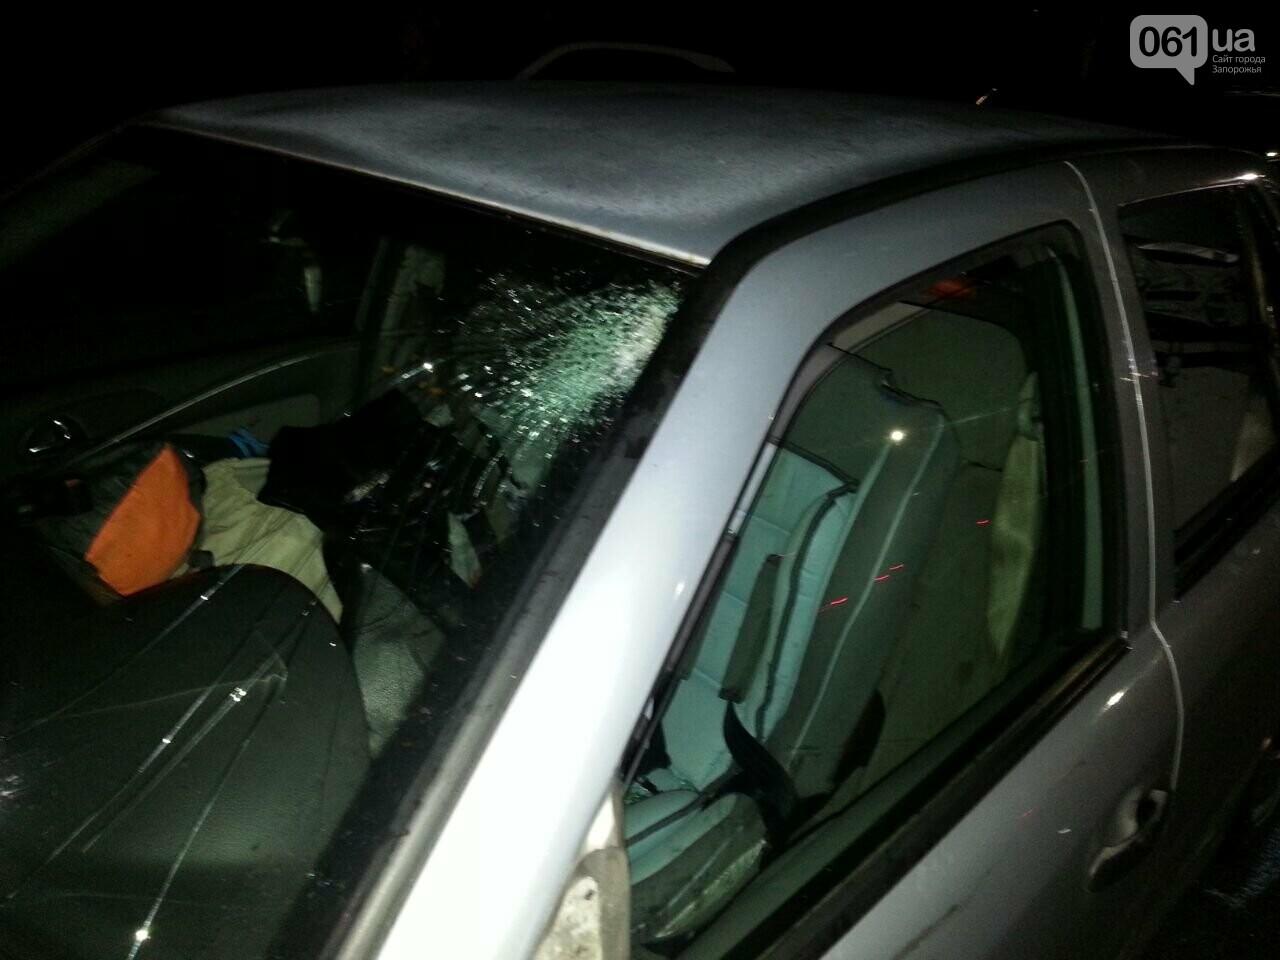 В Запорожье на пешеходном переходе сбили мужчину, — ФОТО, фото-2